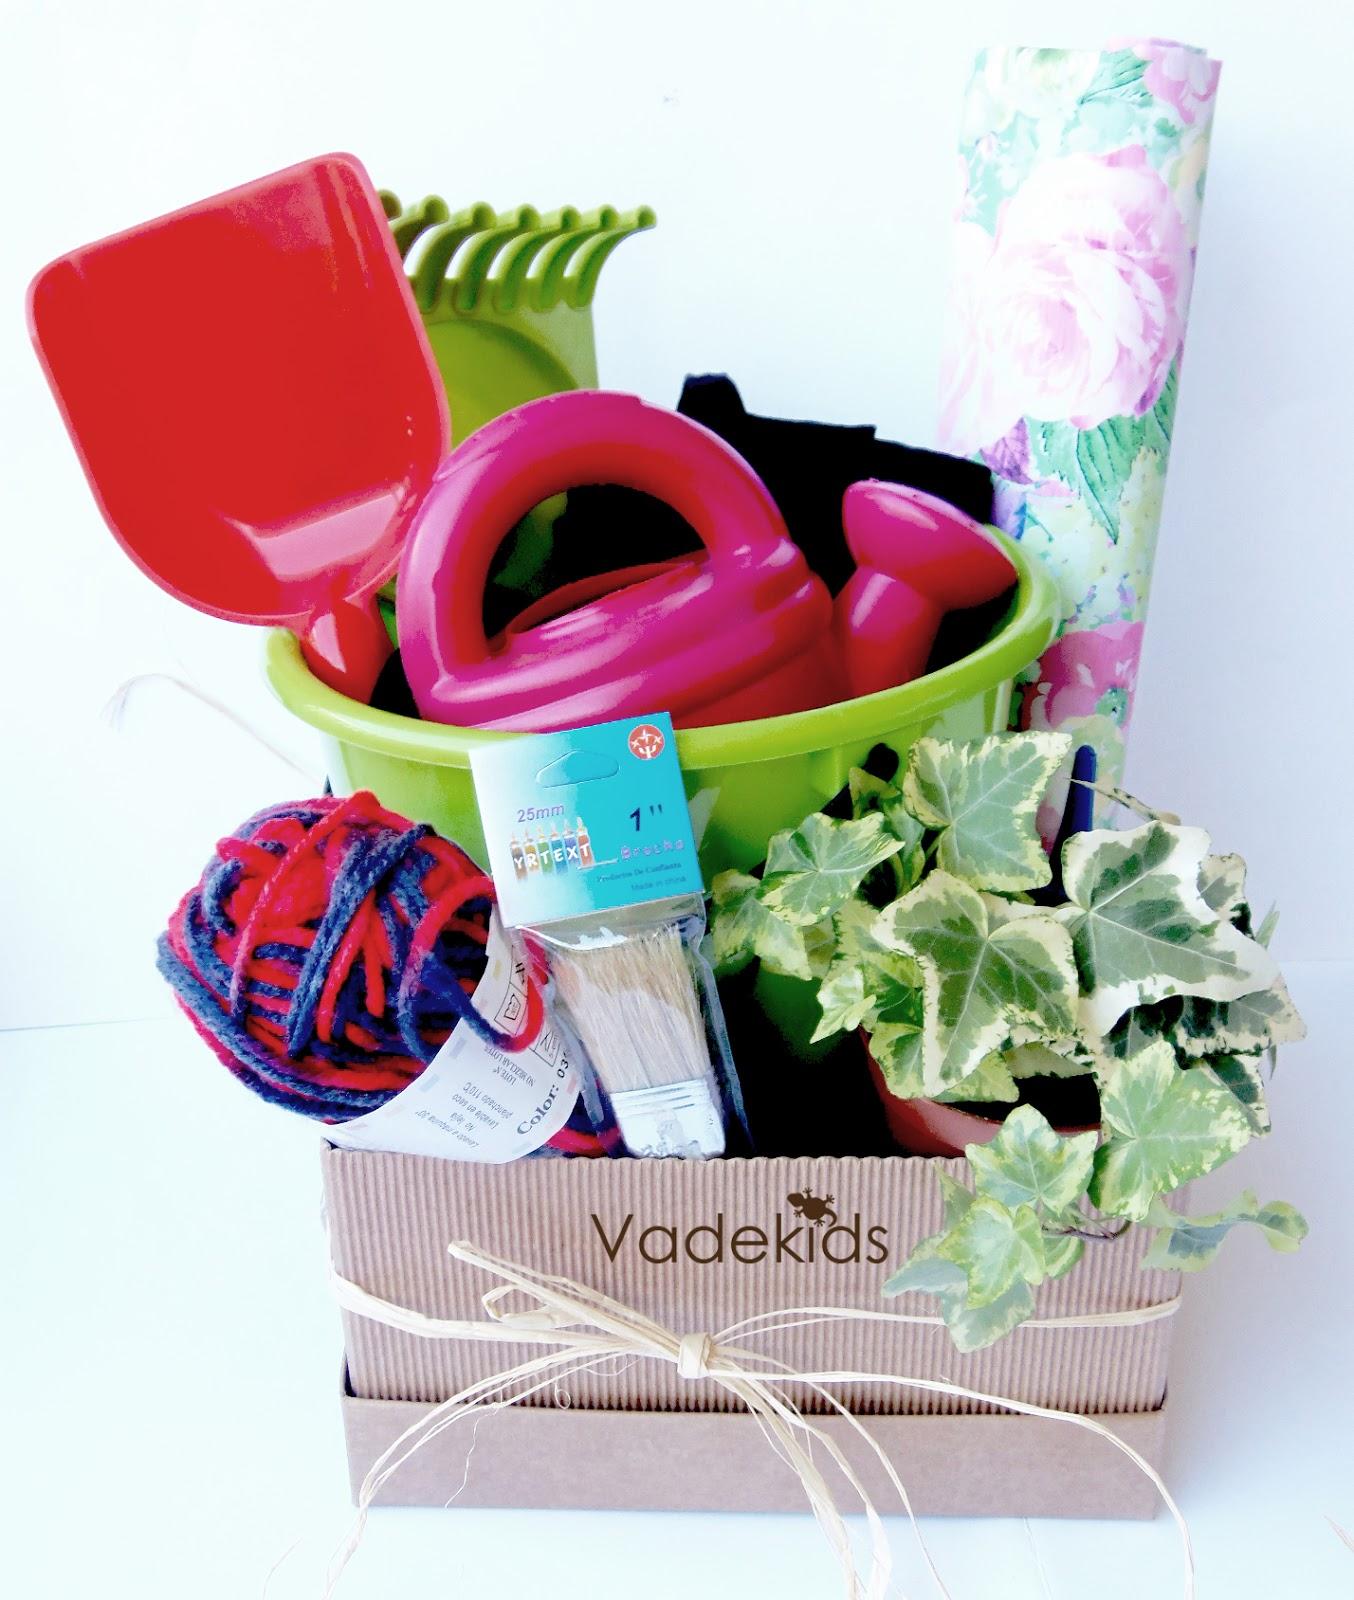 Vadekids kit de jardineria for Herramientas jardineria ninos